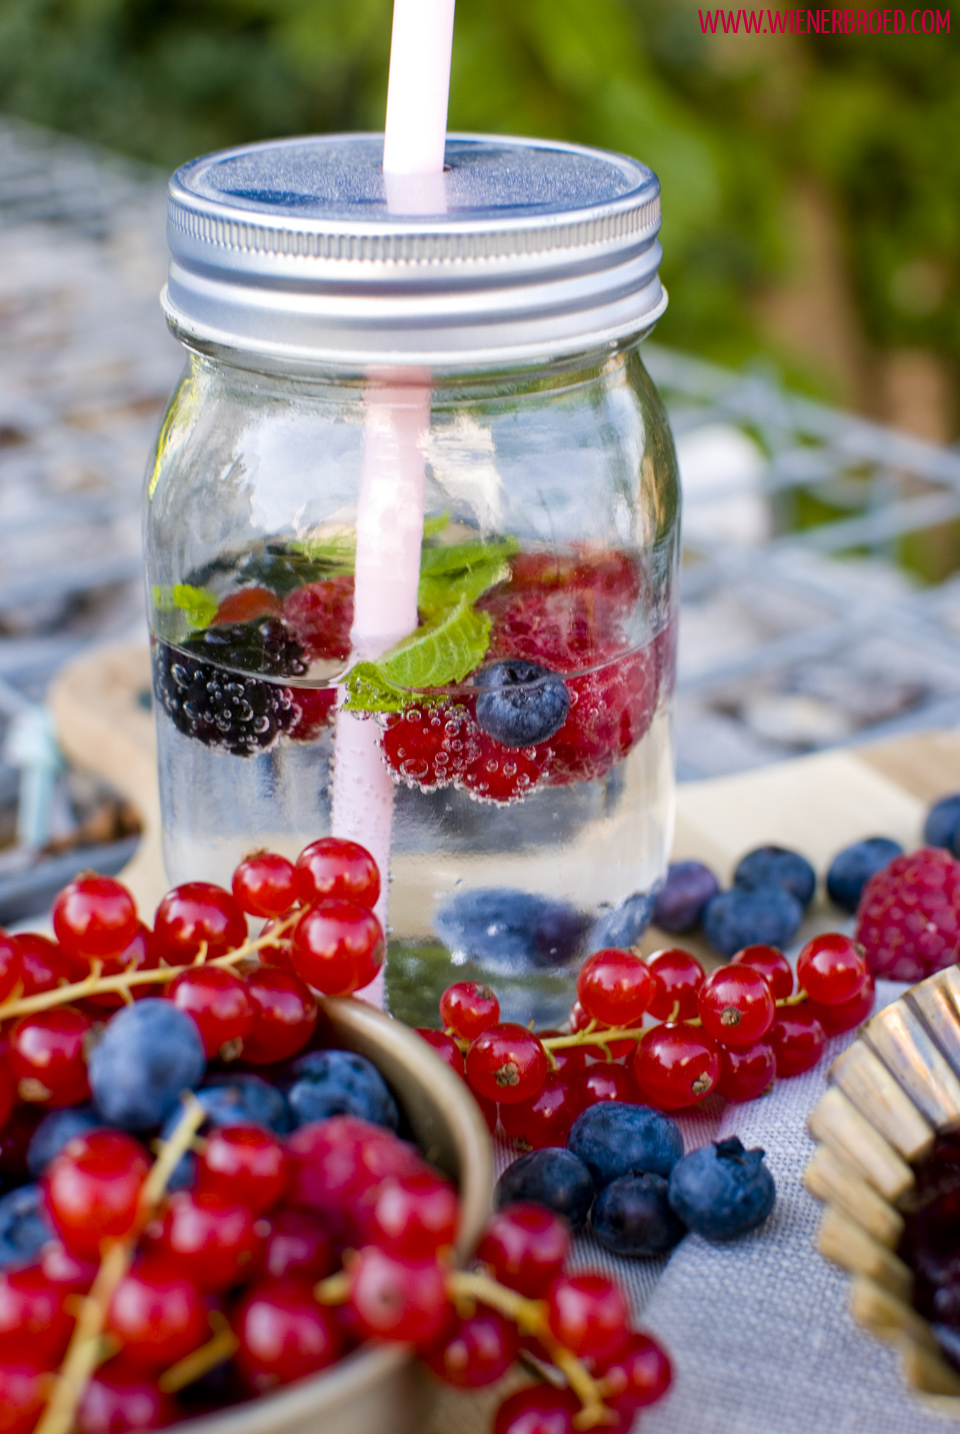 """Rødgrød med flød"" - Rote Grütze mit Sahne / Danish red berry jelly with cream [wienerbroed.com]"